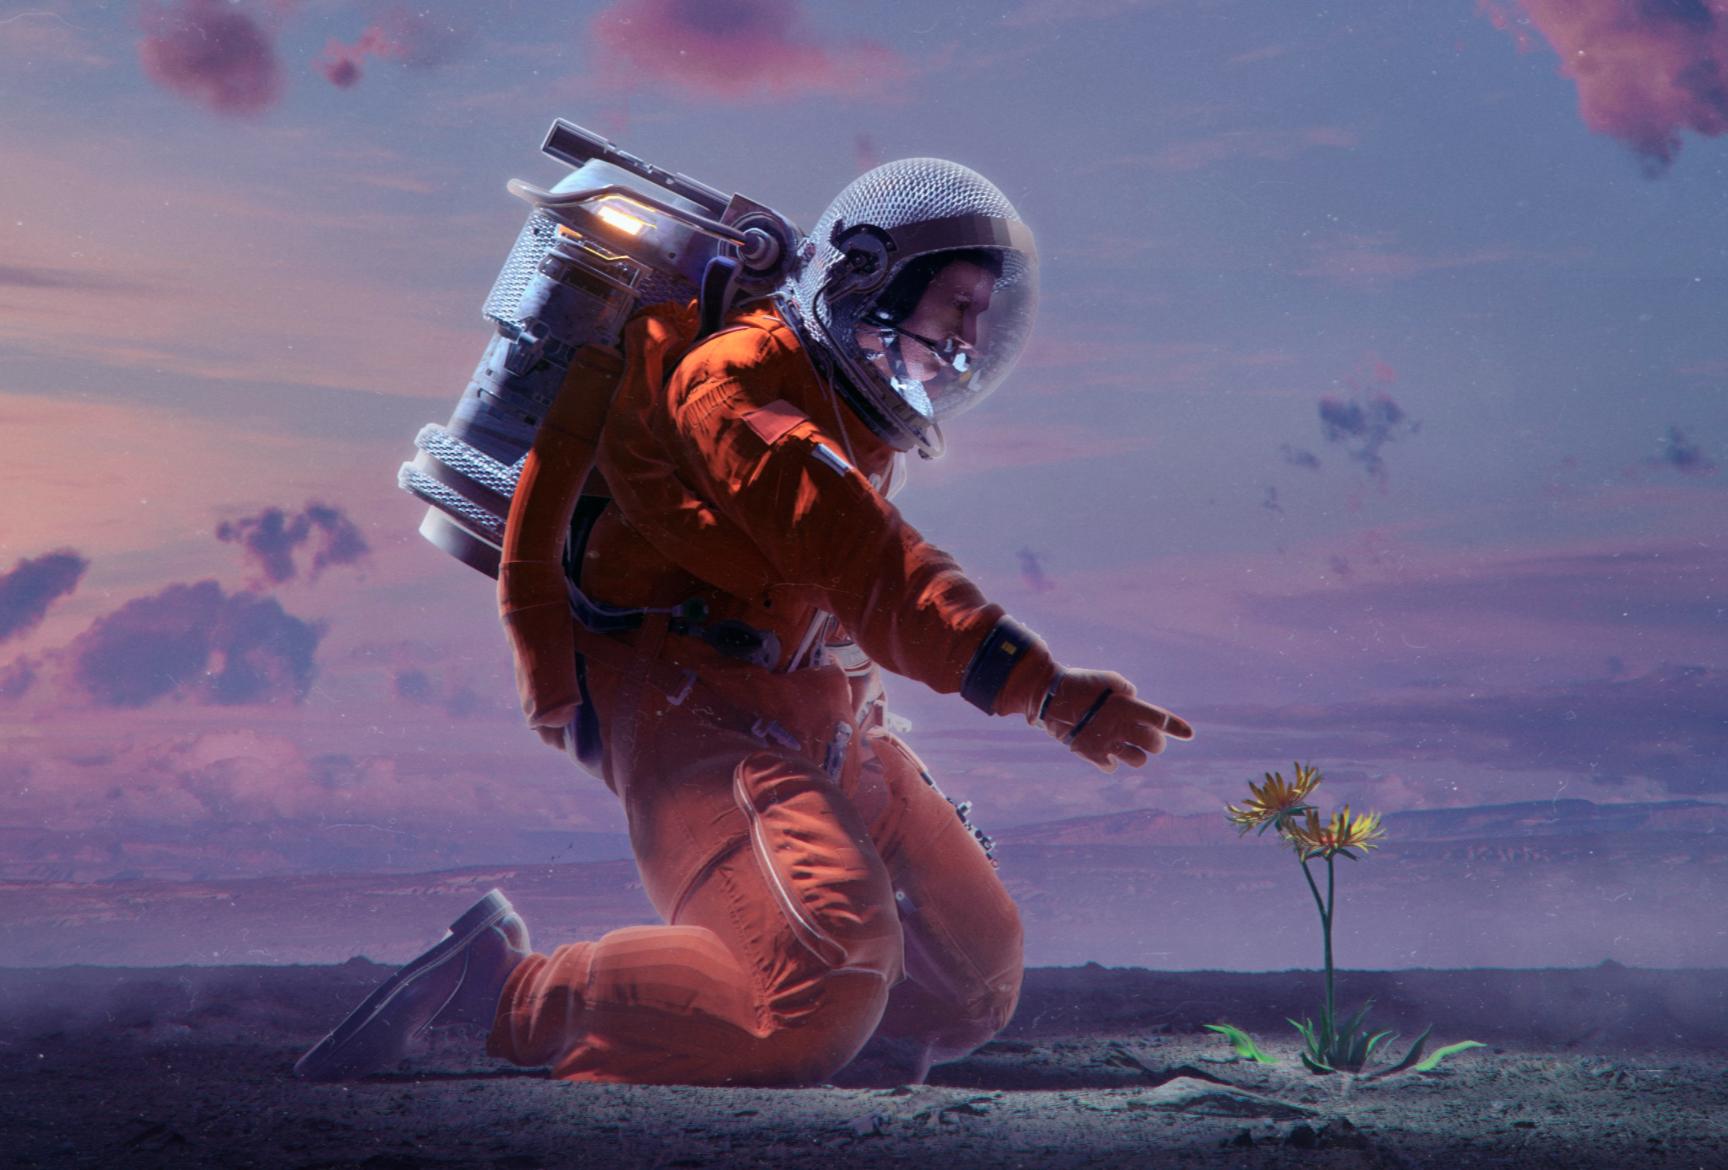 Beeple, bringing life to Mars